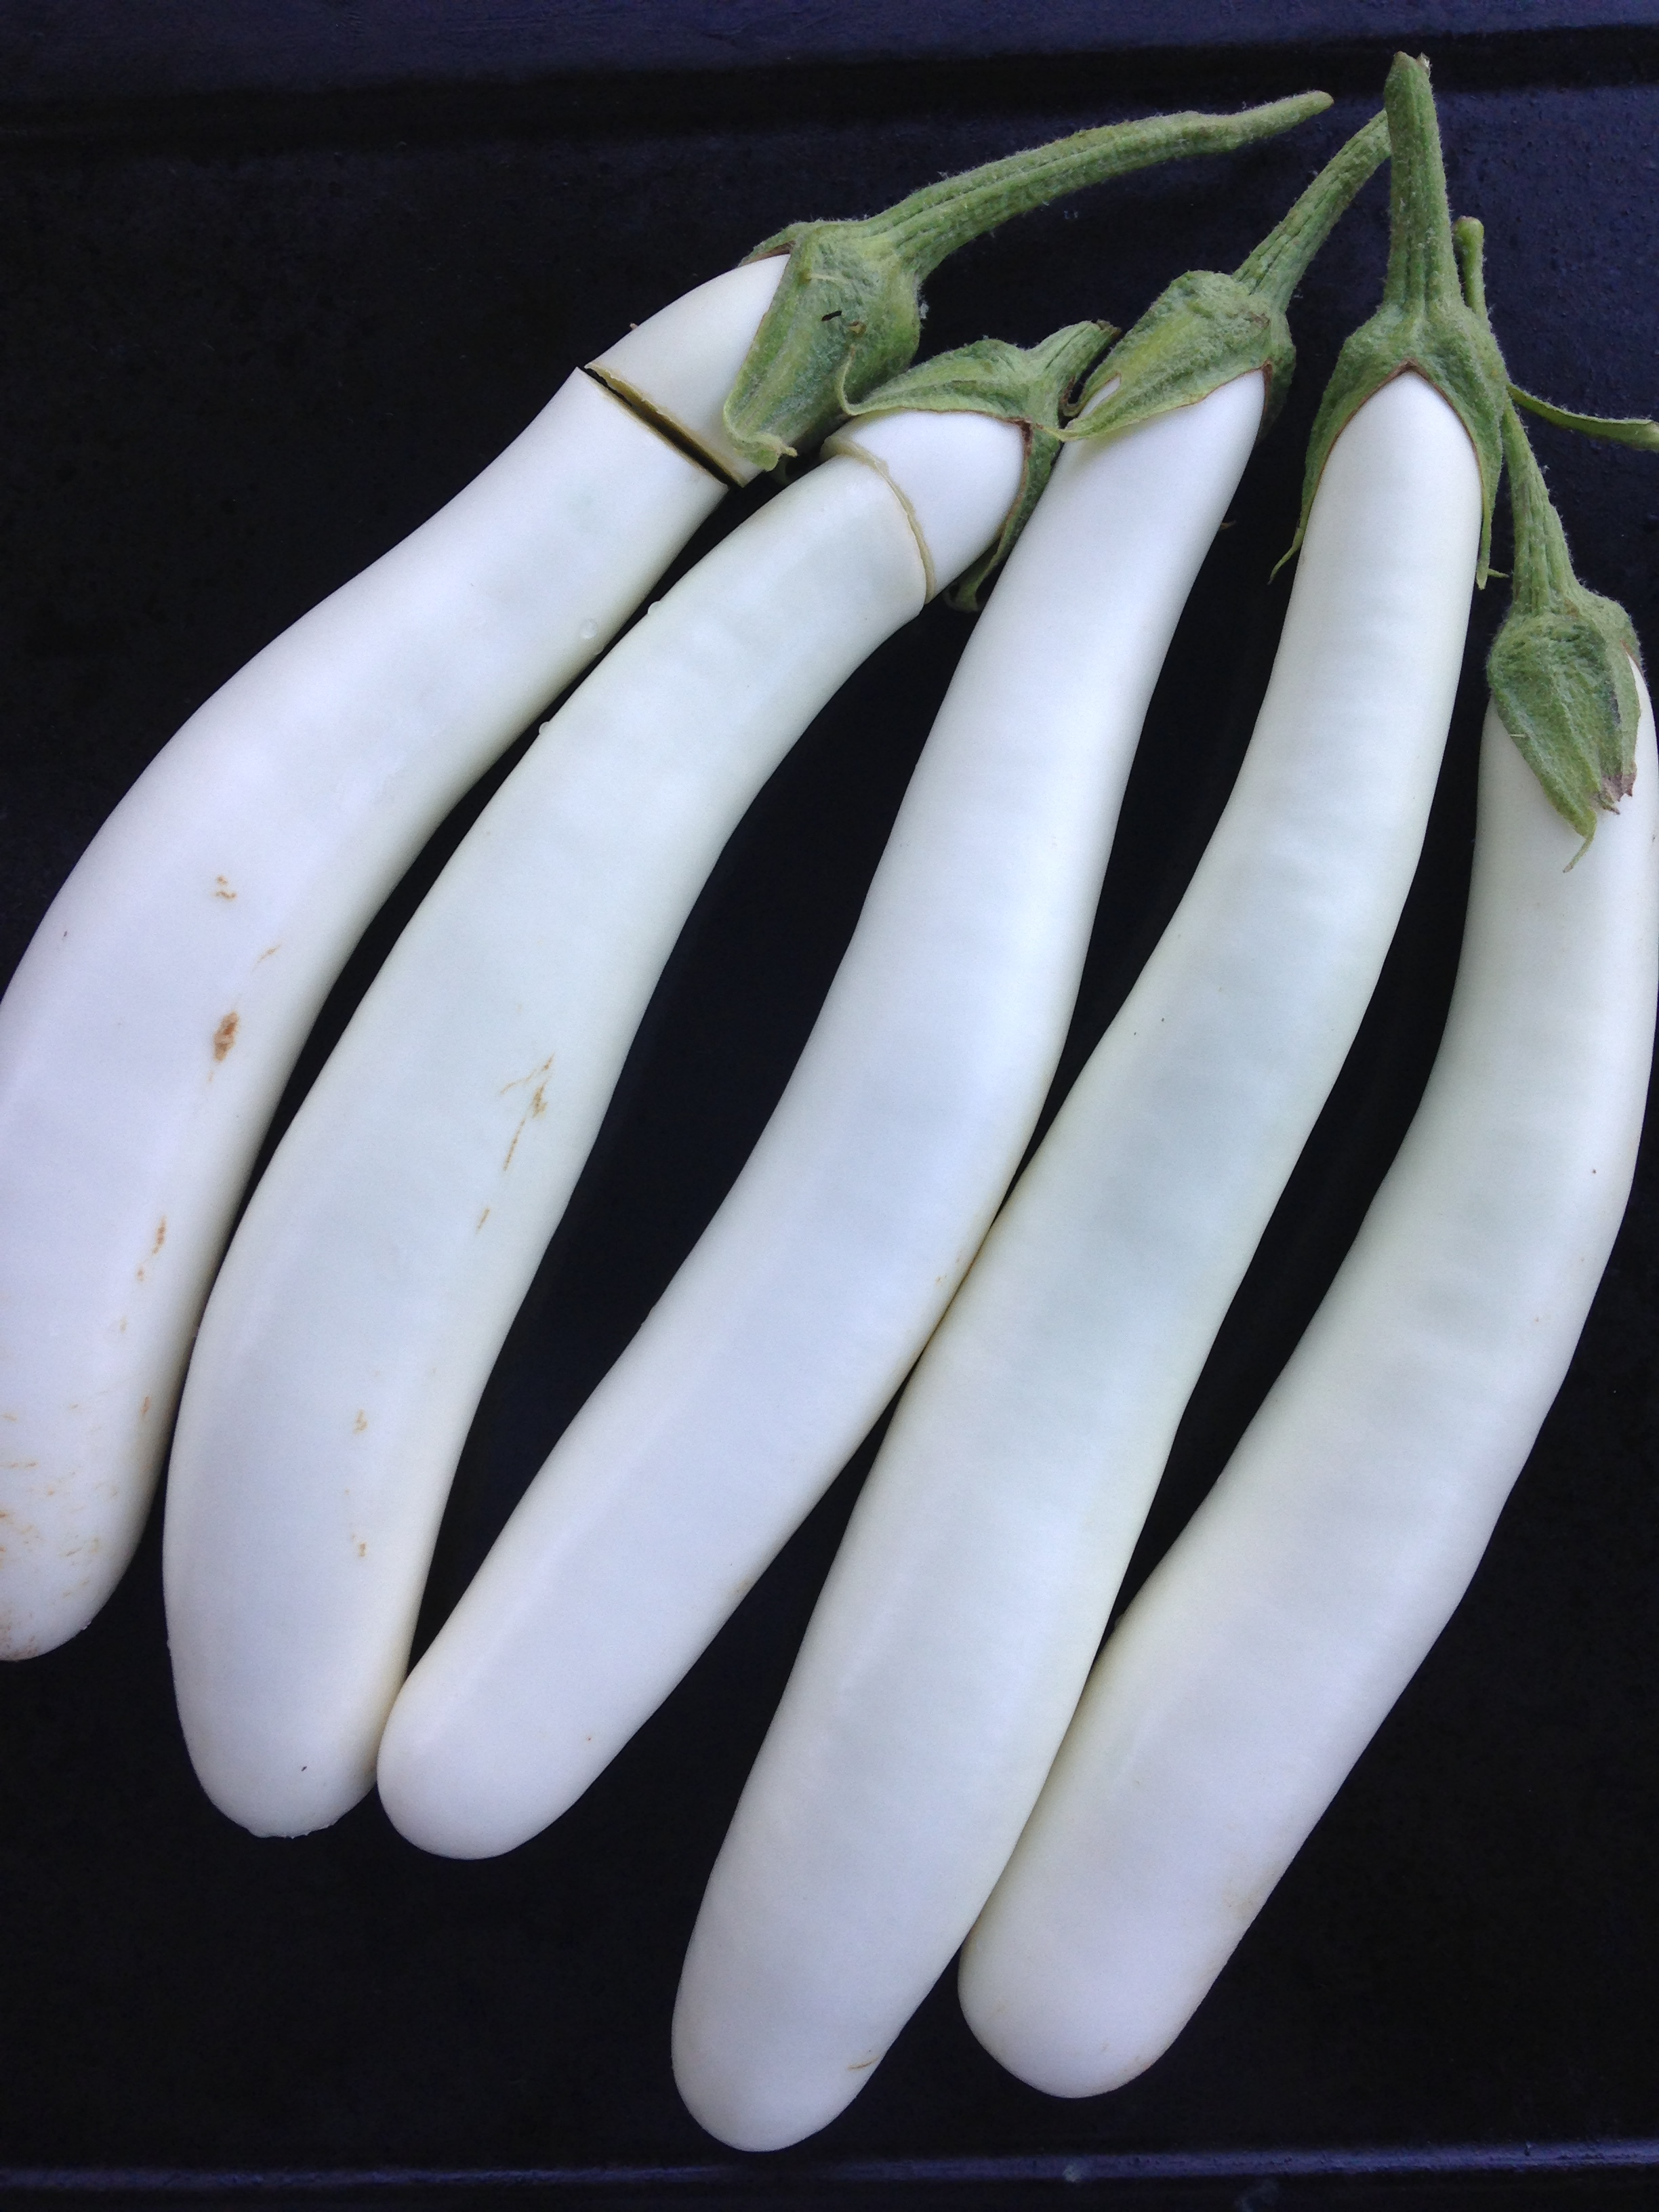 Full grown 'Gretel' eggplants!